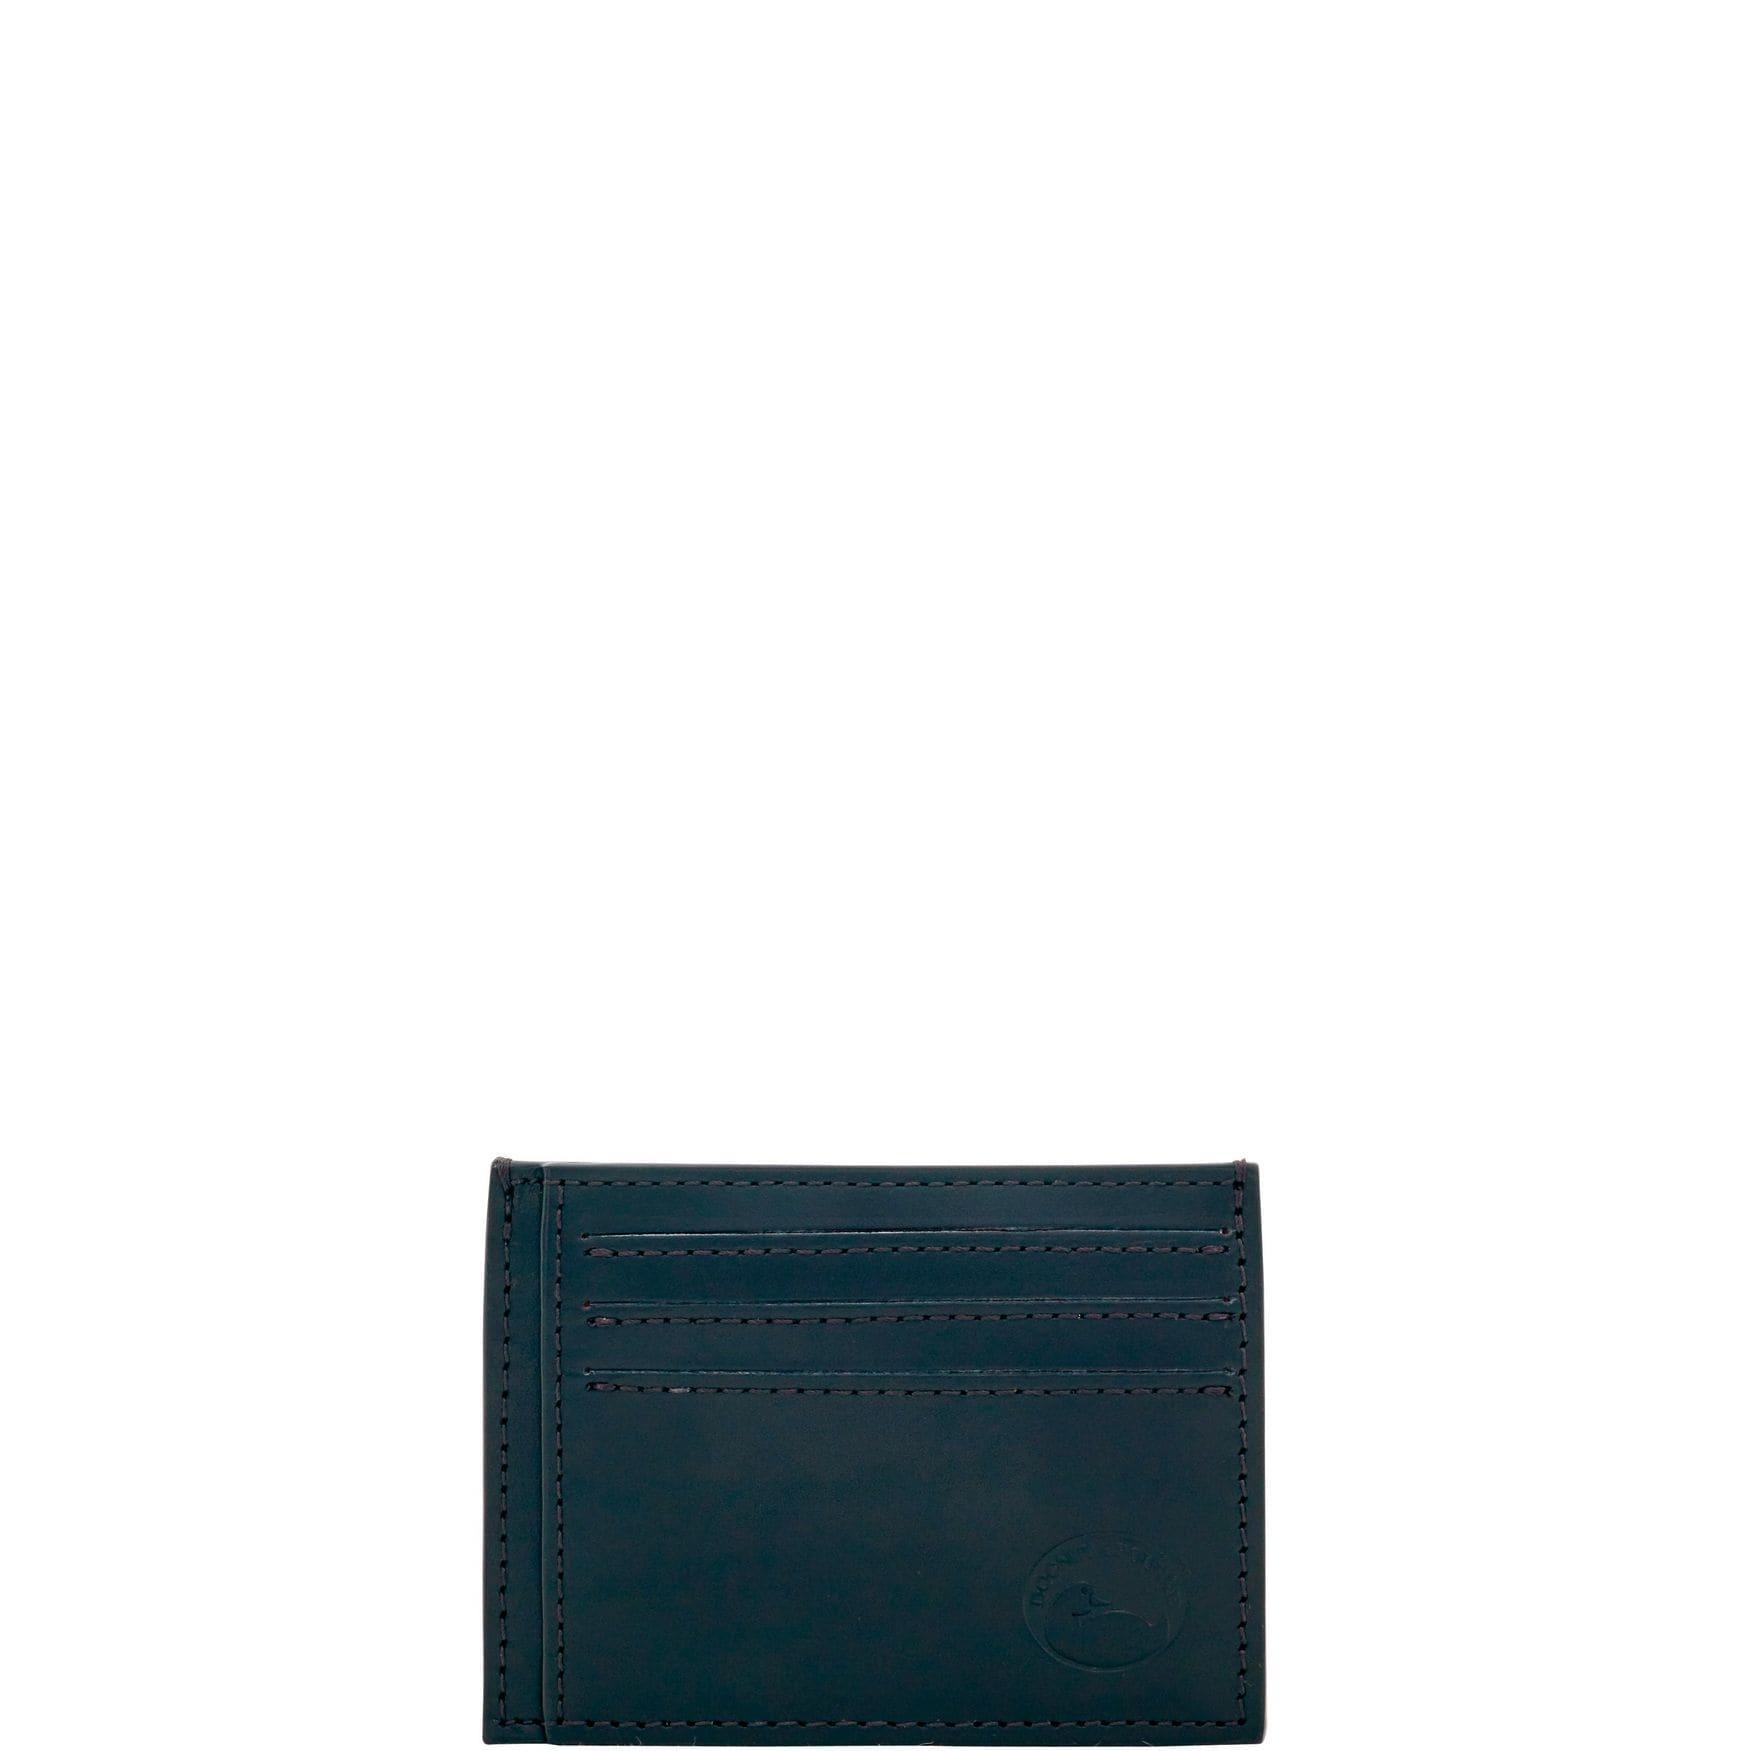 New Anais Gvani Men Genuine Soft Leather Bifold Wallet Card Holder Cases Bag